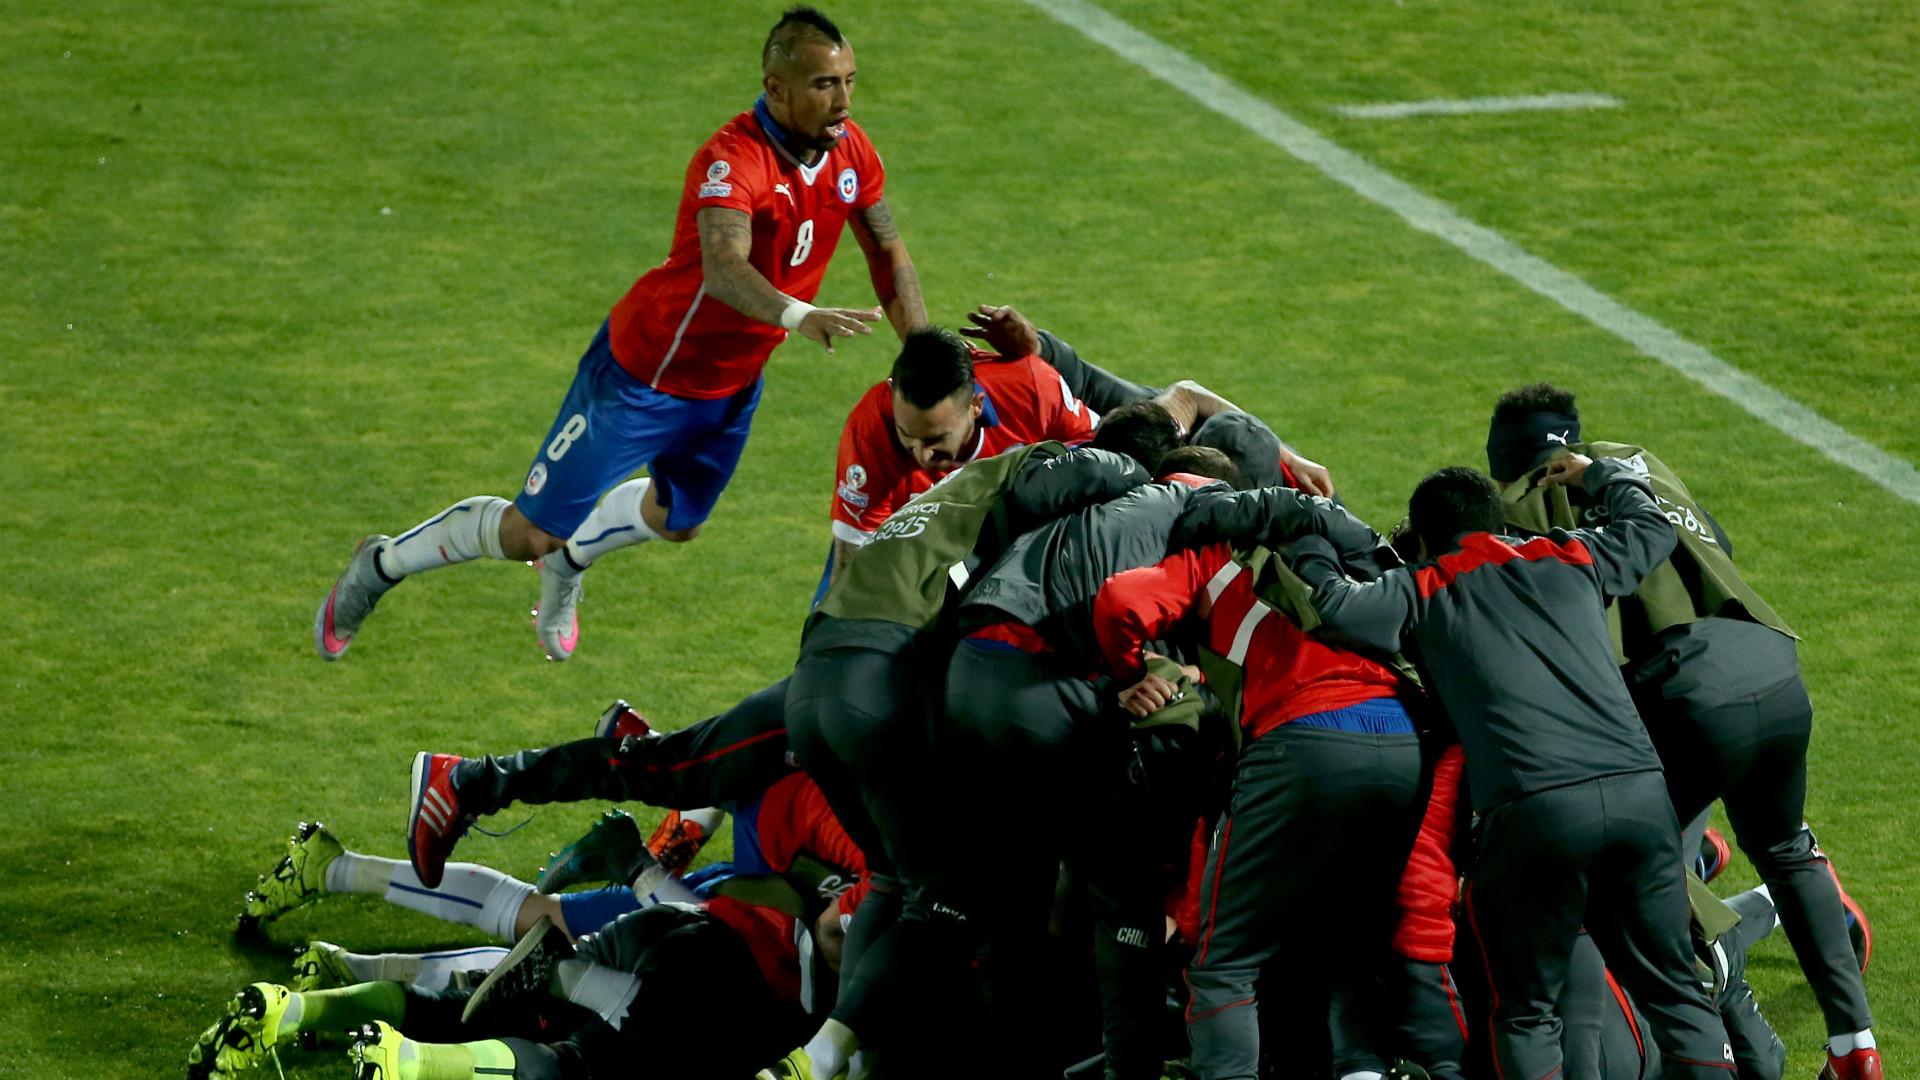 chile-celebrate-uruguay-copa-america_1n2mdduflr69y1iviemtnfg1l1